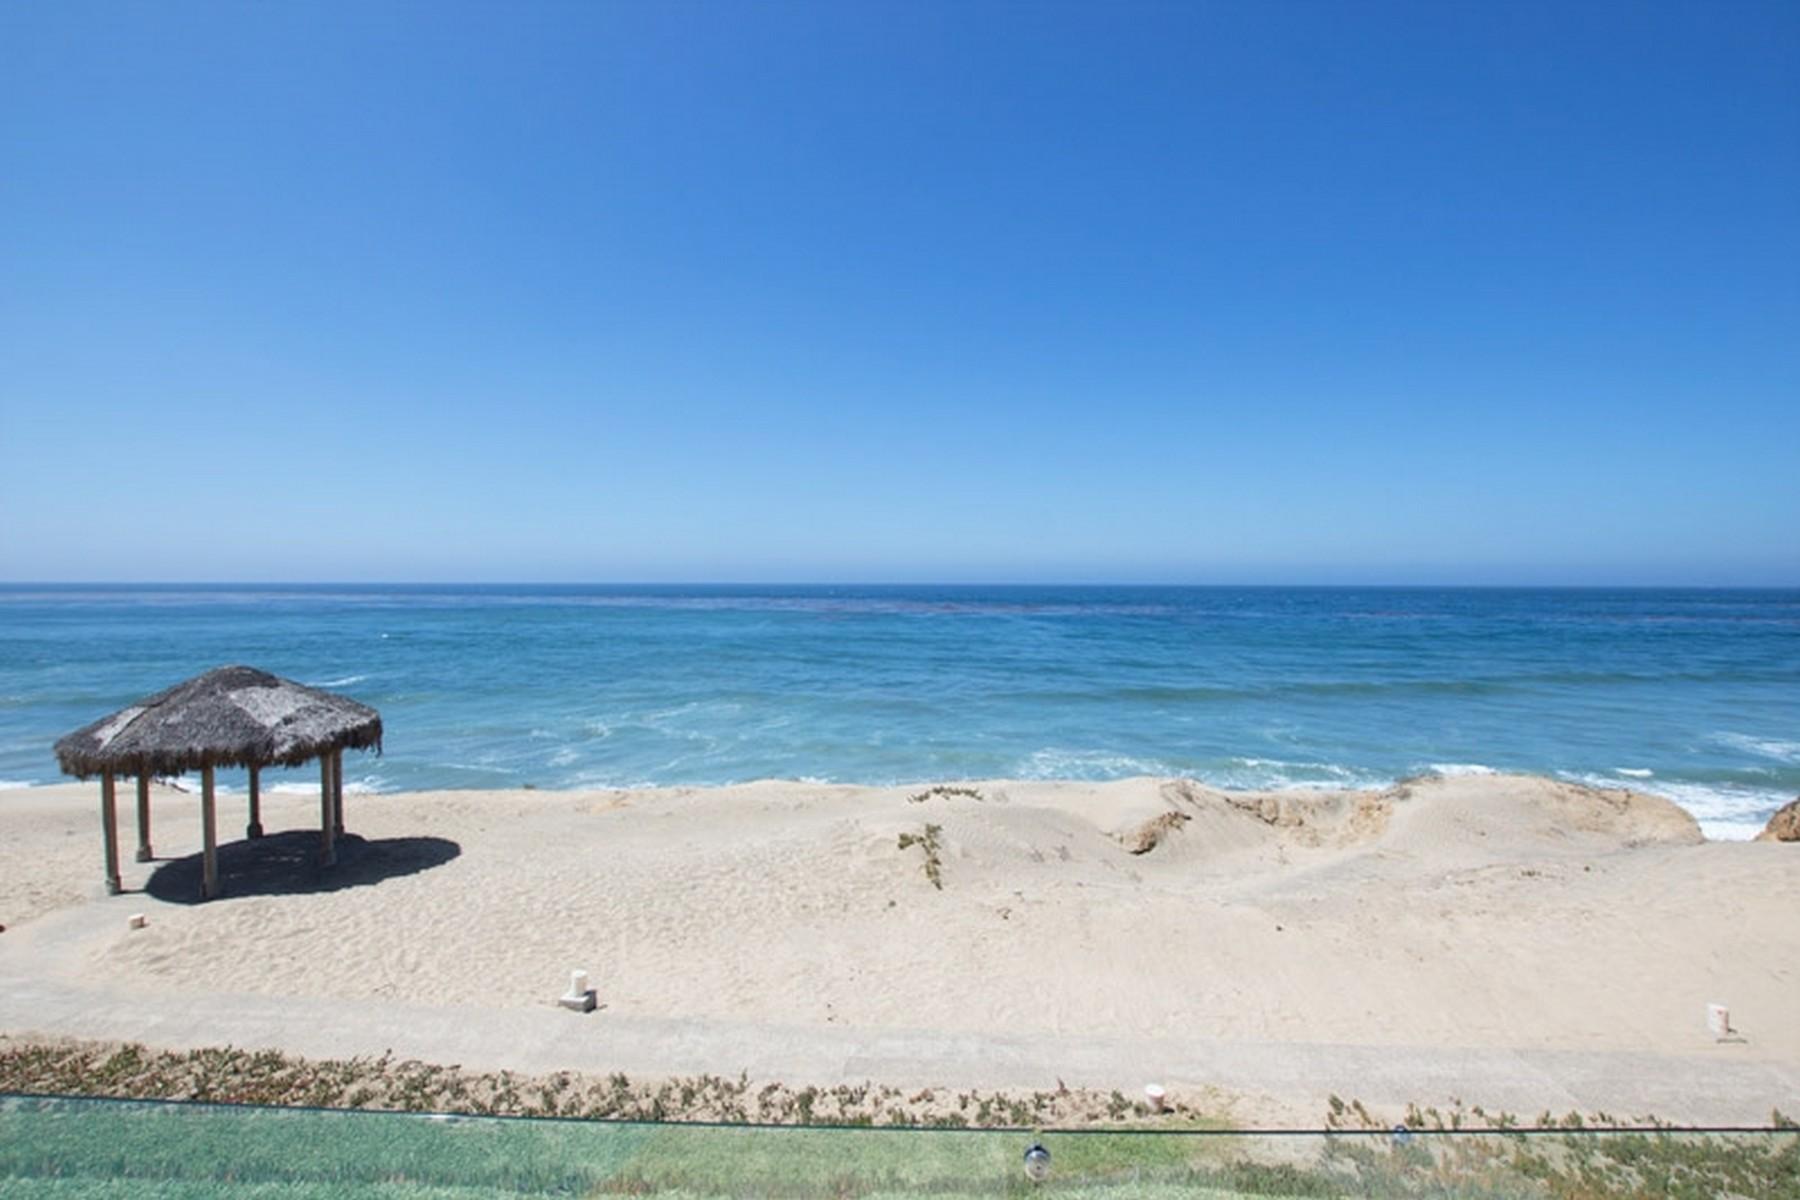 Condominiums for Sale at Palacio del Mar Condos & Spa 201 Other Areas, California 99999 United States